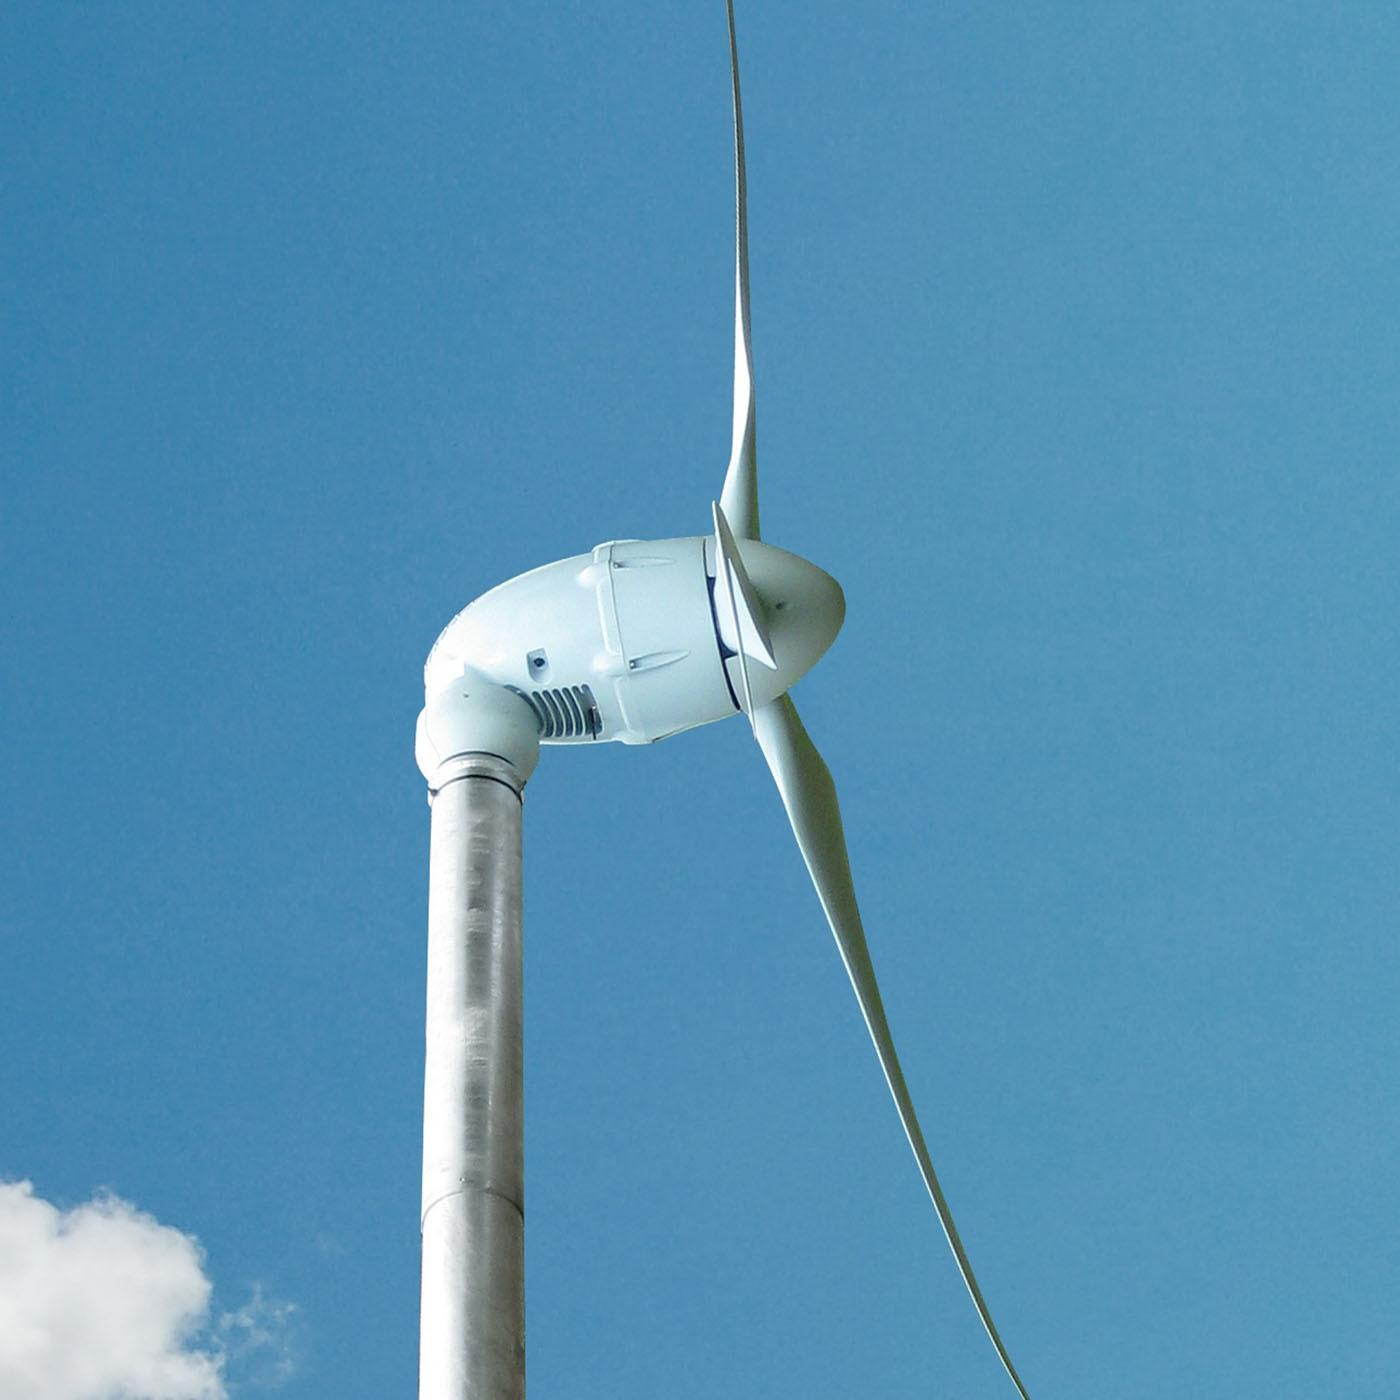 Skystream 600 Southwest Power s New Ultra Efficient Internet